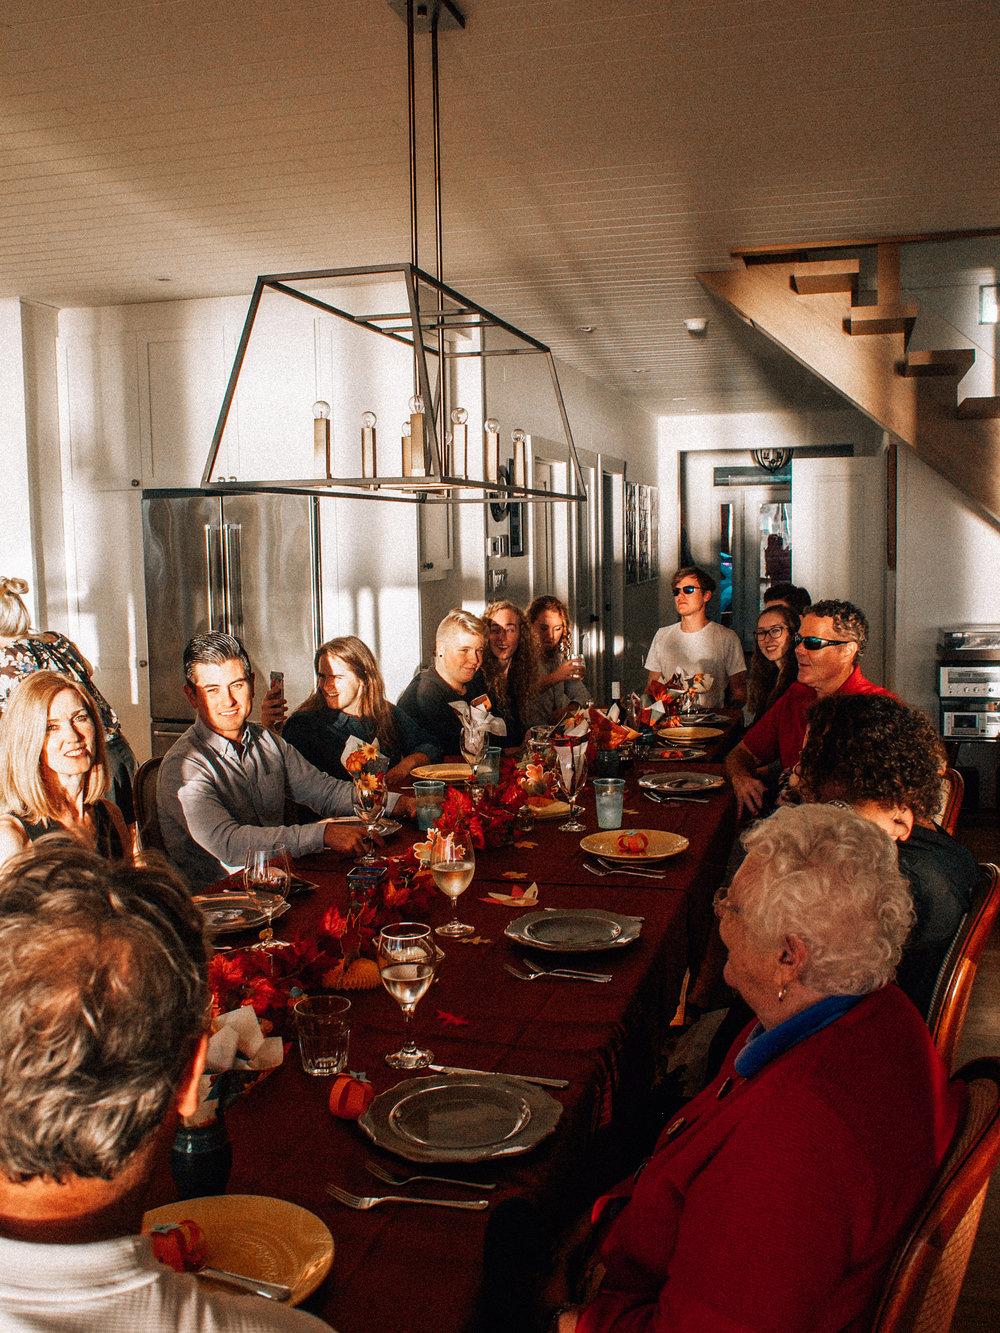 thanksgivingnwb-10.jpg